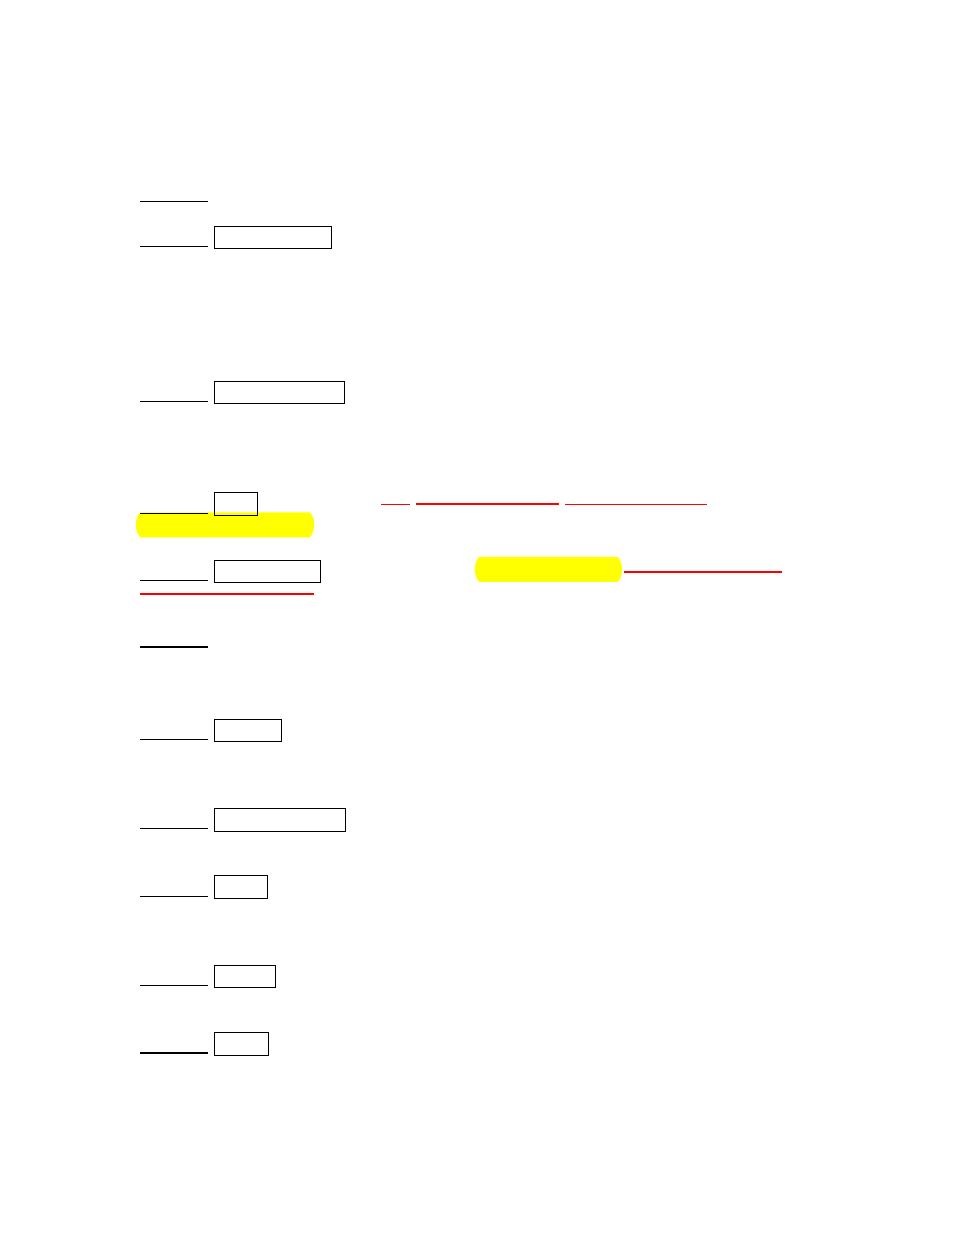 firstech llc compustar cm3000 user manual page 6 8 rh manualsdir com